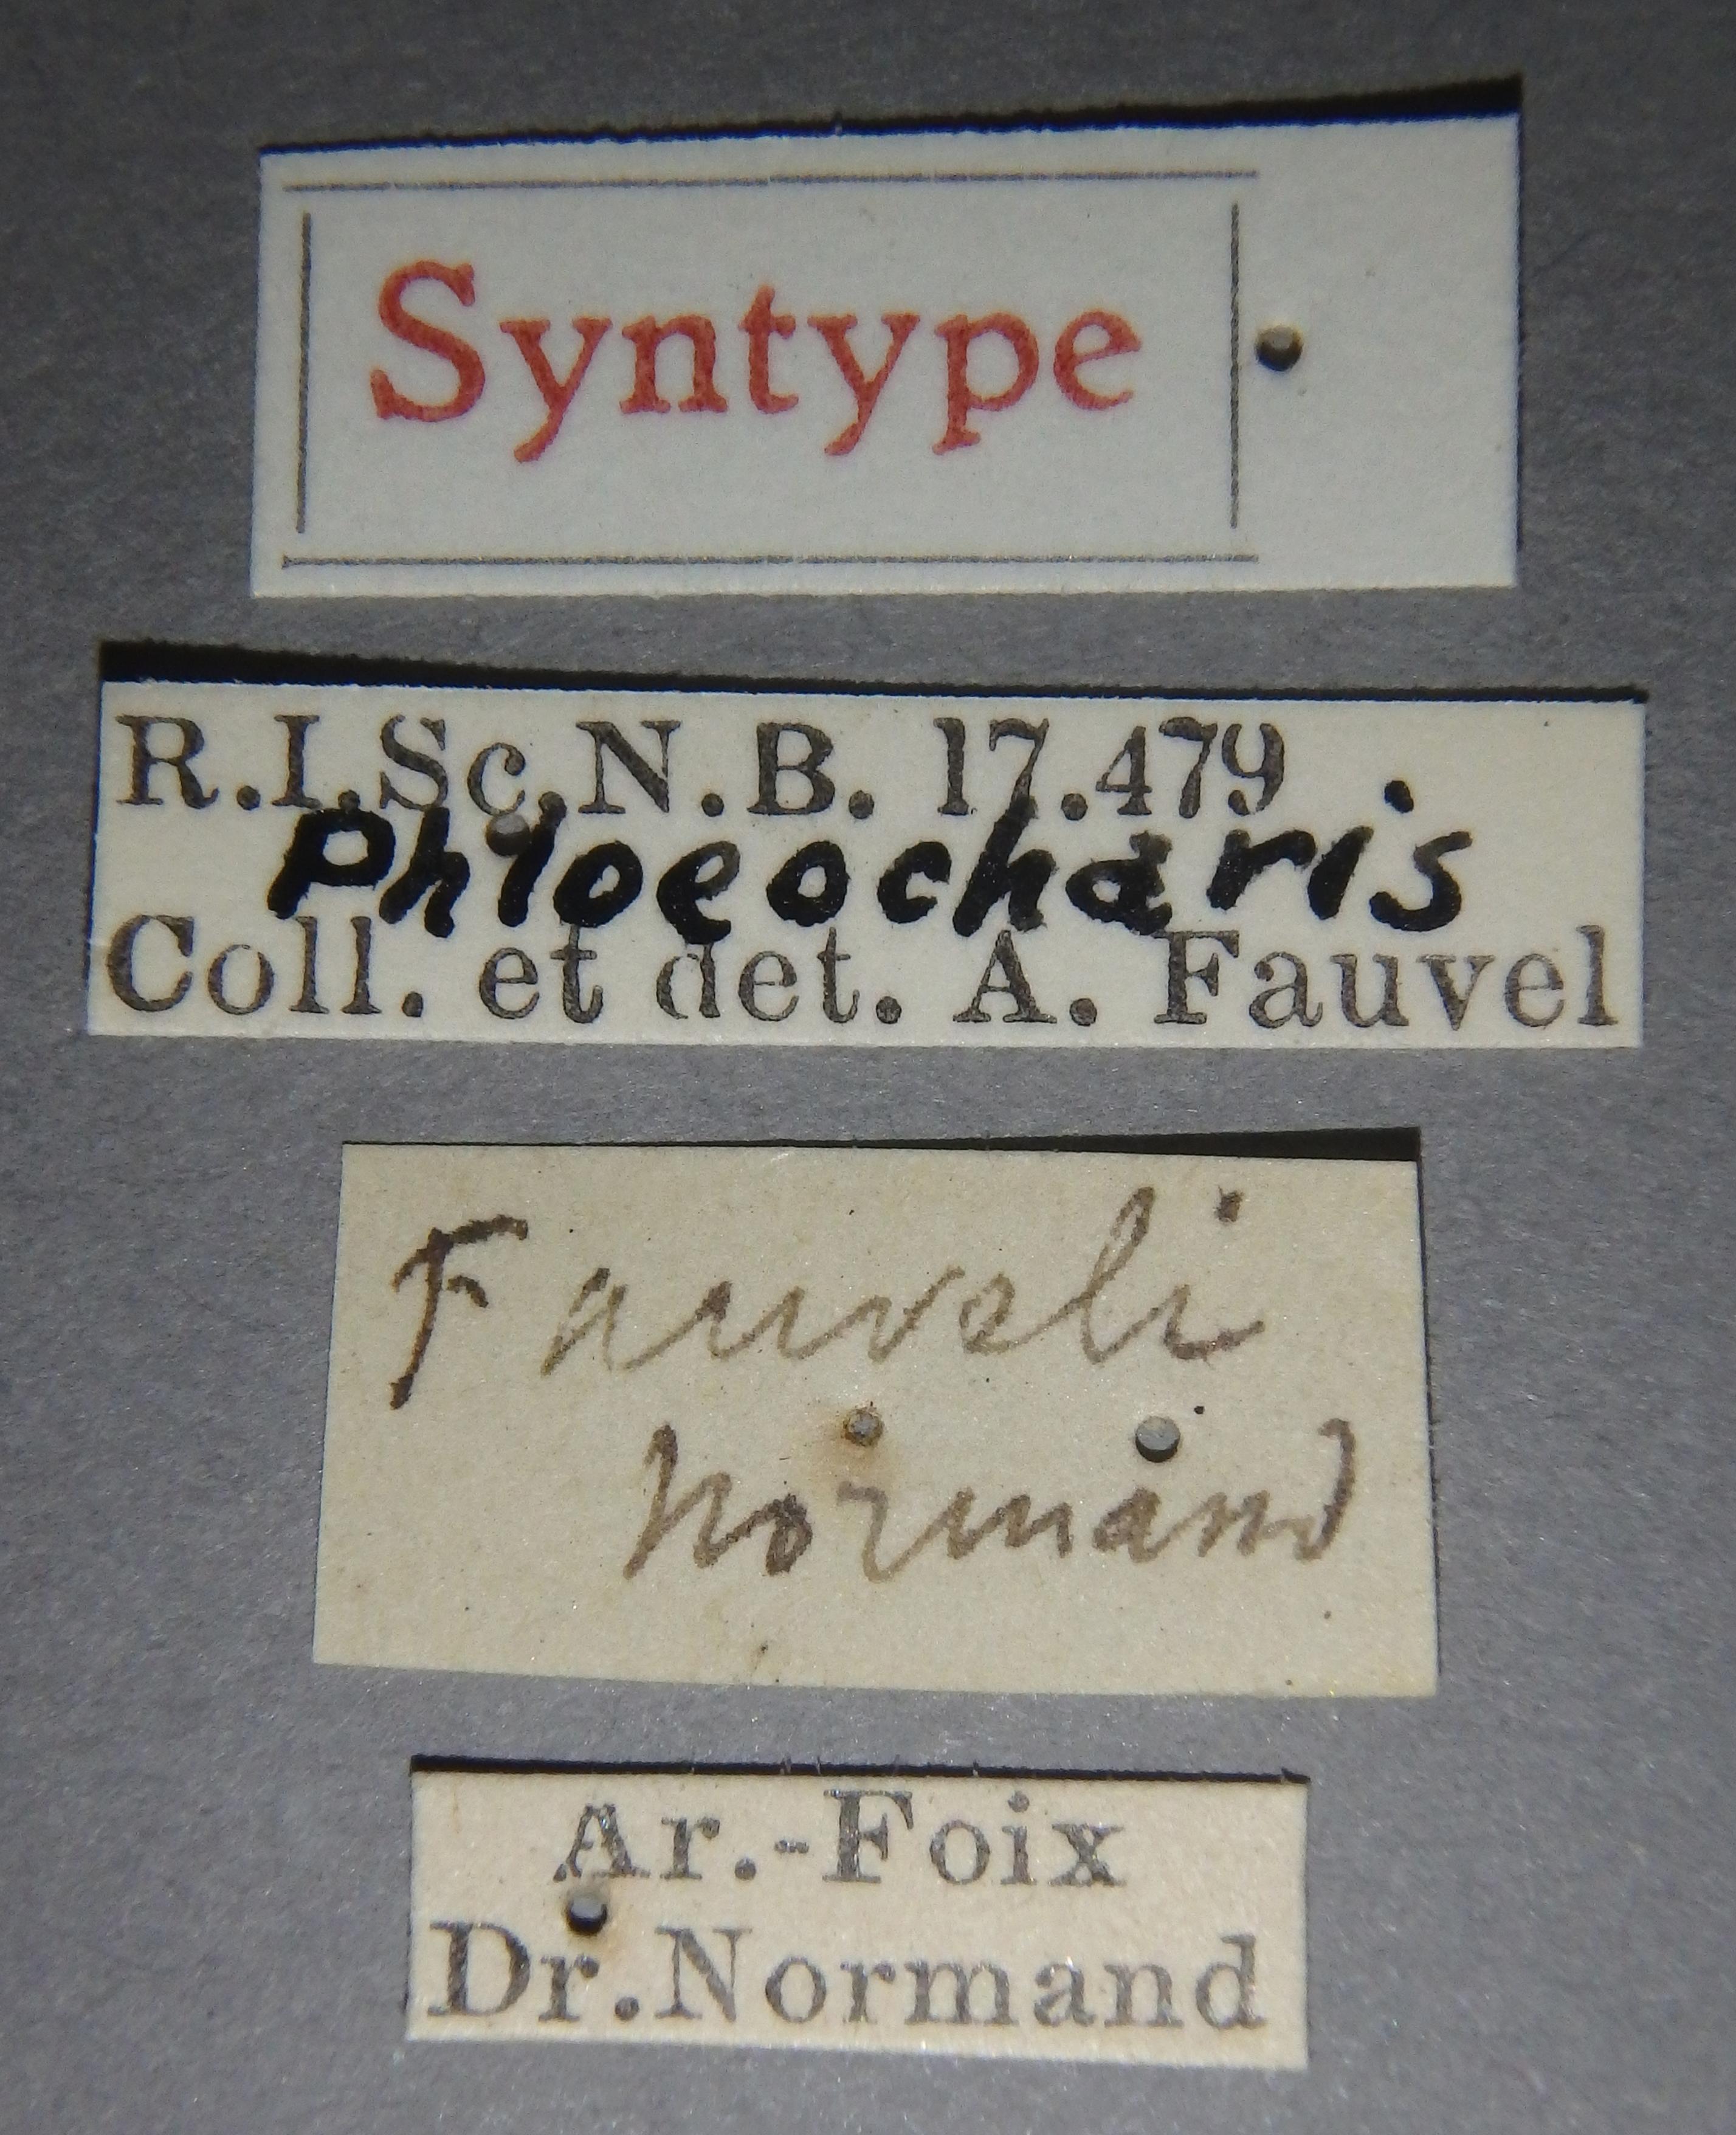 Phloeocharis fauveli st Lb.JPG